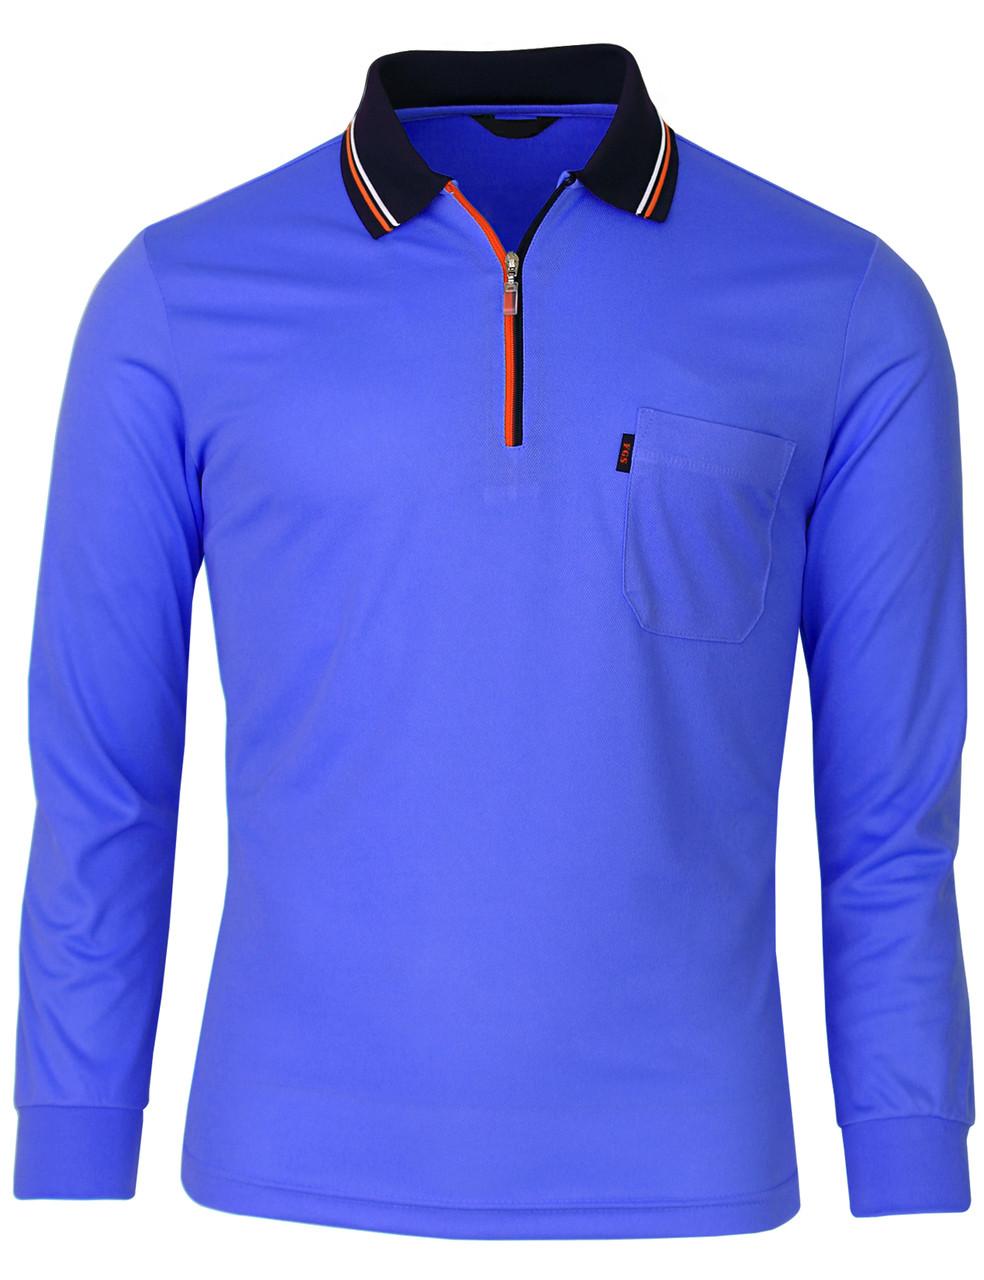 17237c05 Long Sleeve Dri Fit Zip Polo Shirt-Unisex